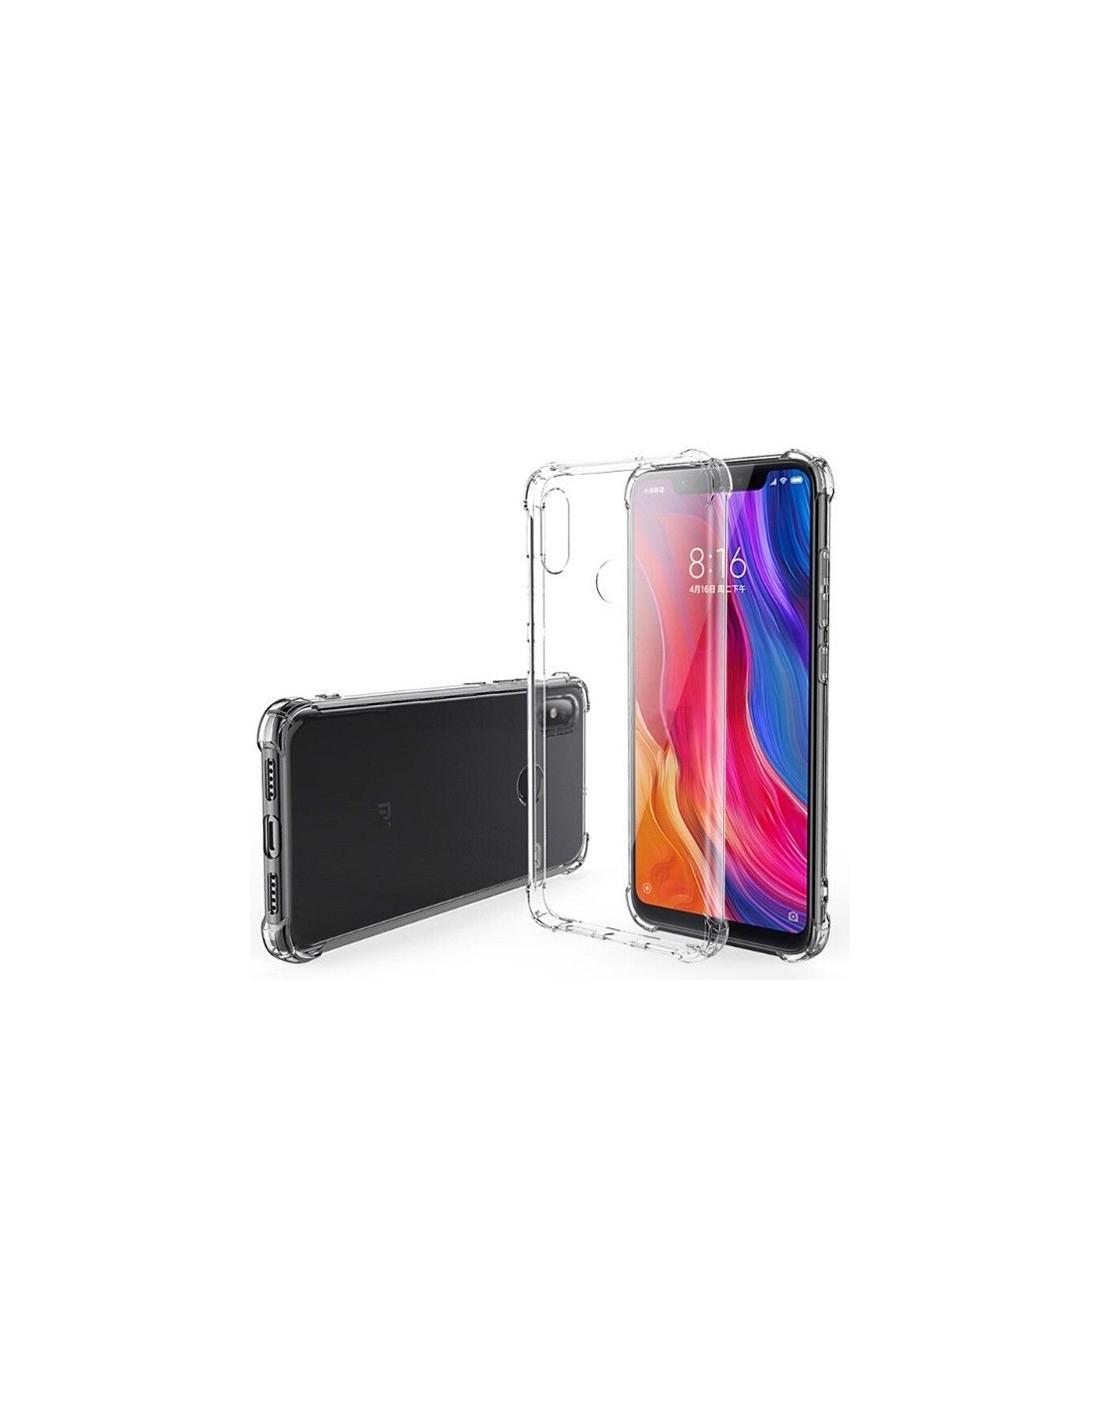 Max Power Digital Xiaomi Funda Heavy Duty H/íbrida Rugged Armor Case Choque Absorci/ón Protecci/ón Dual Layer Bumper Carcasa con Pata Trasera para Xiaomi Redmi Note 4//4X, Rojo